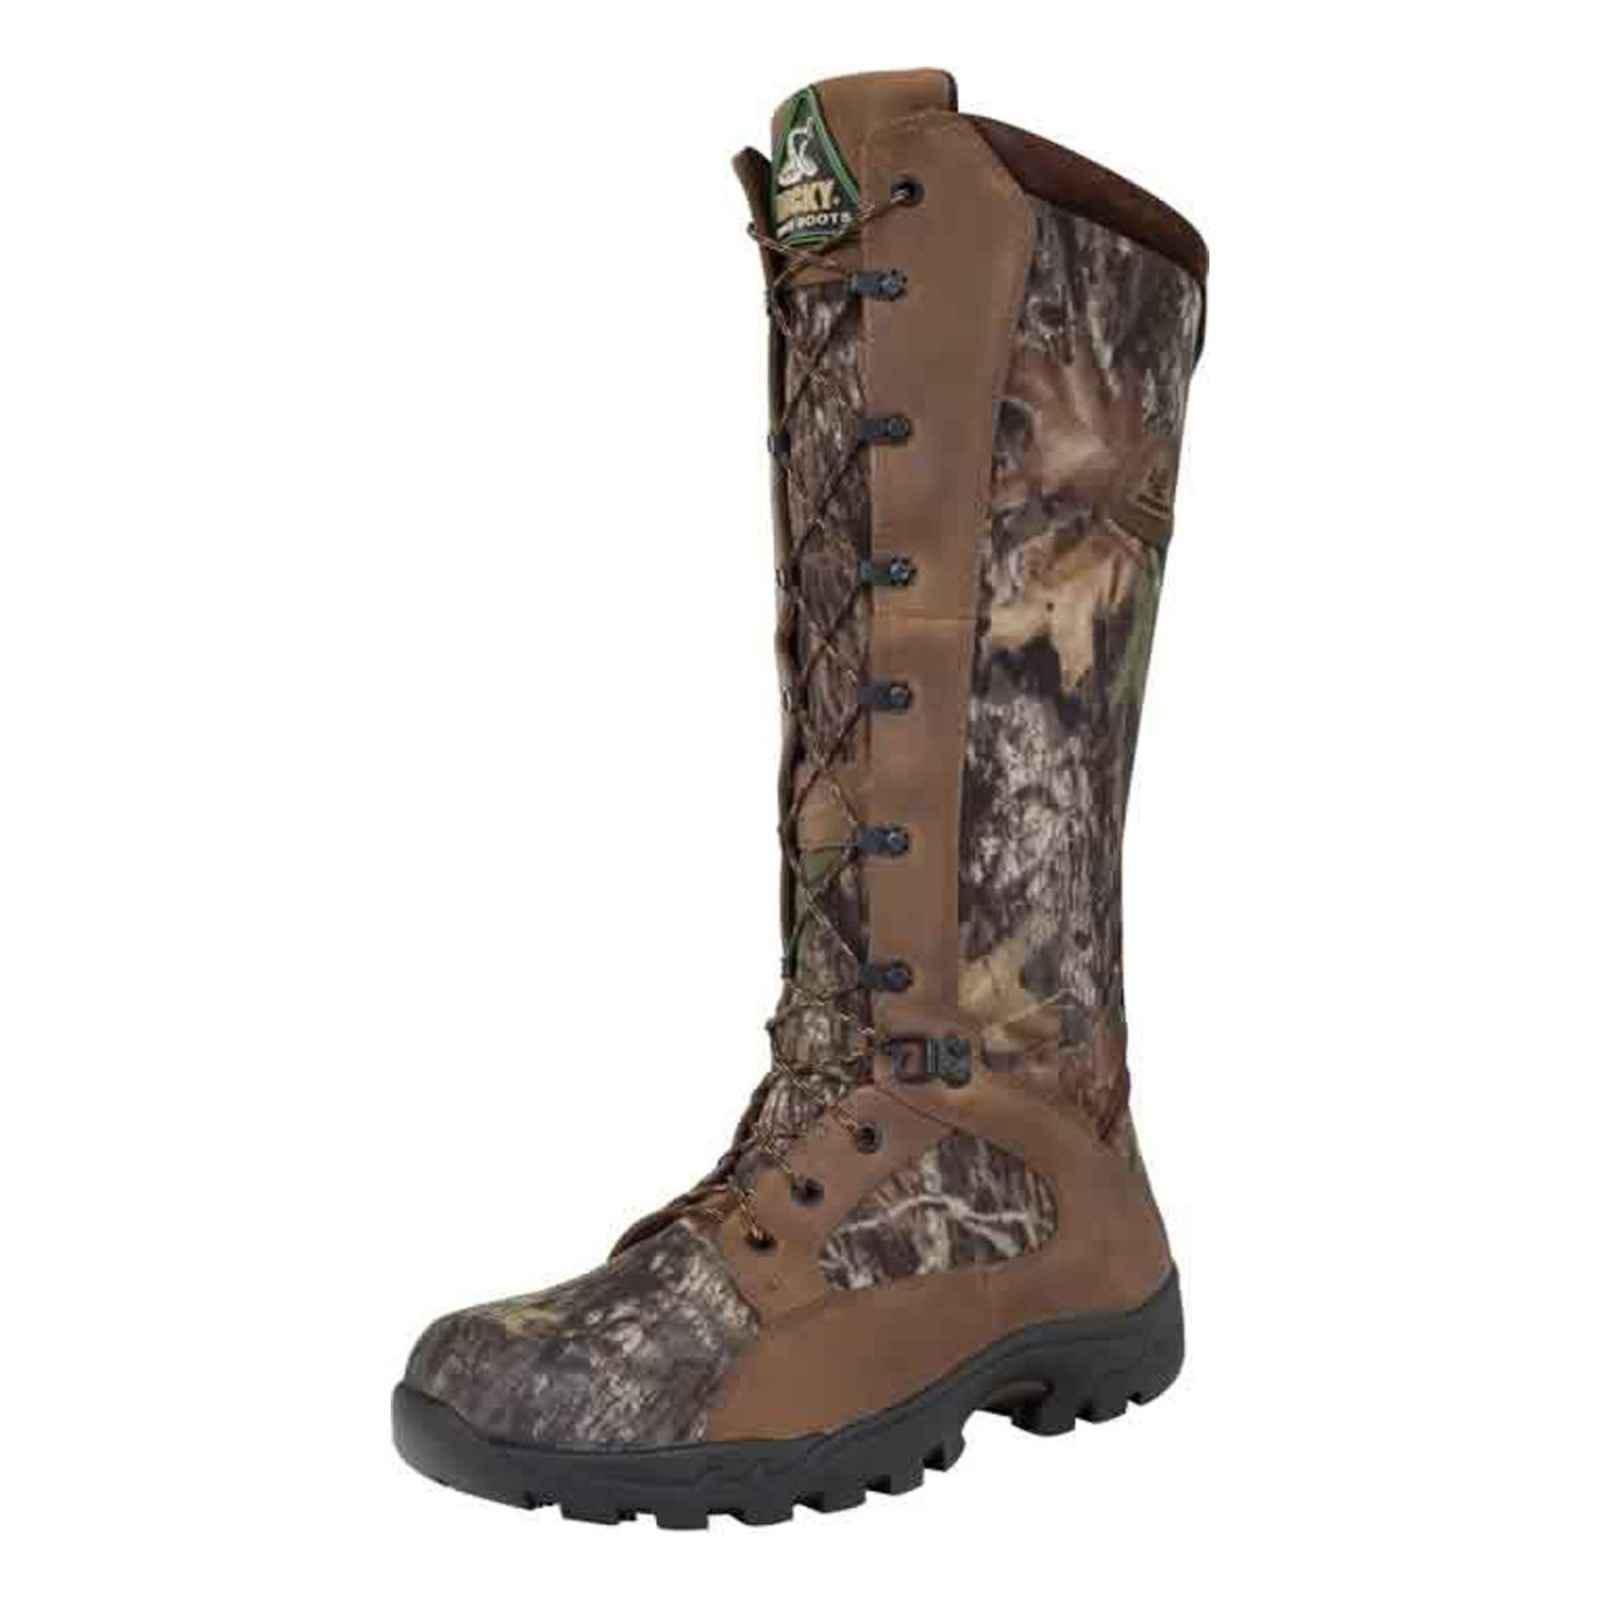 Rocky Men's Prolight Waterproof Snake Proof Hunting Boots, FQ0001570 7WI